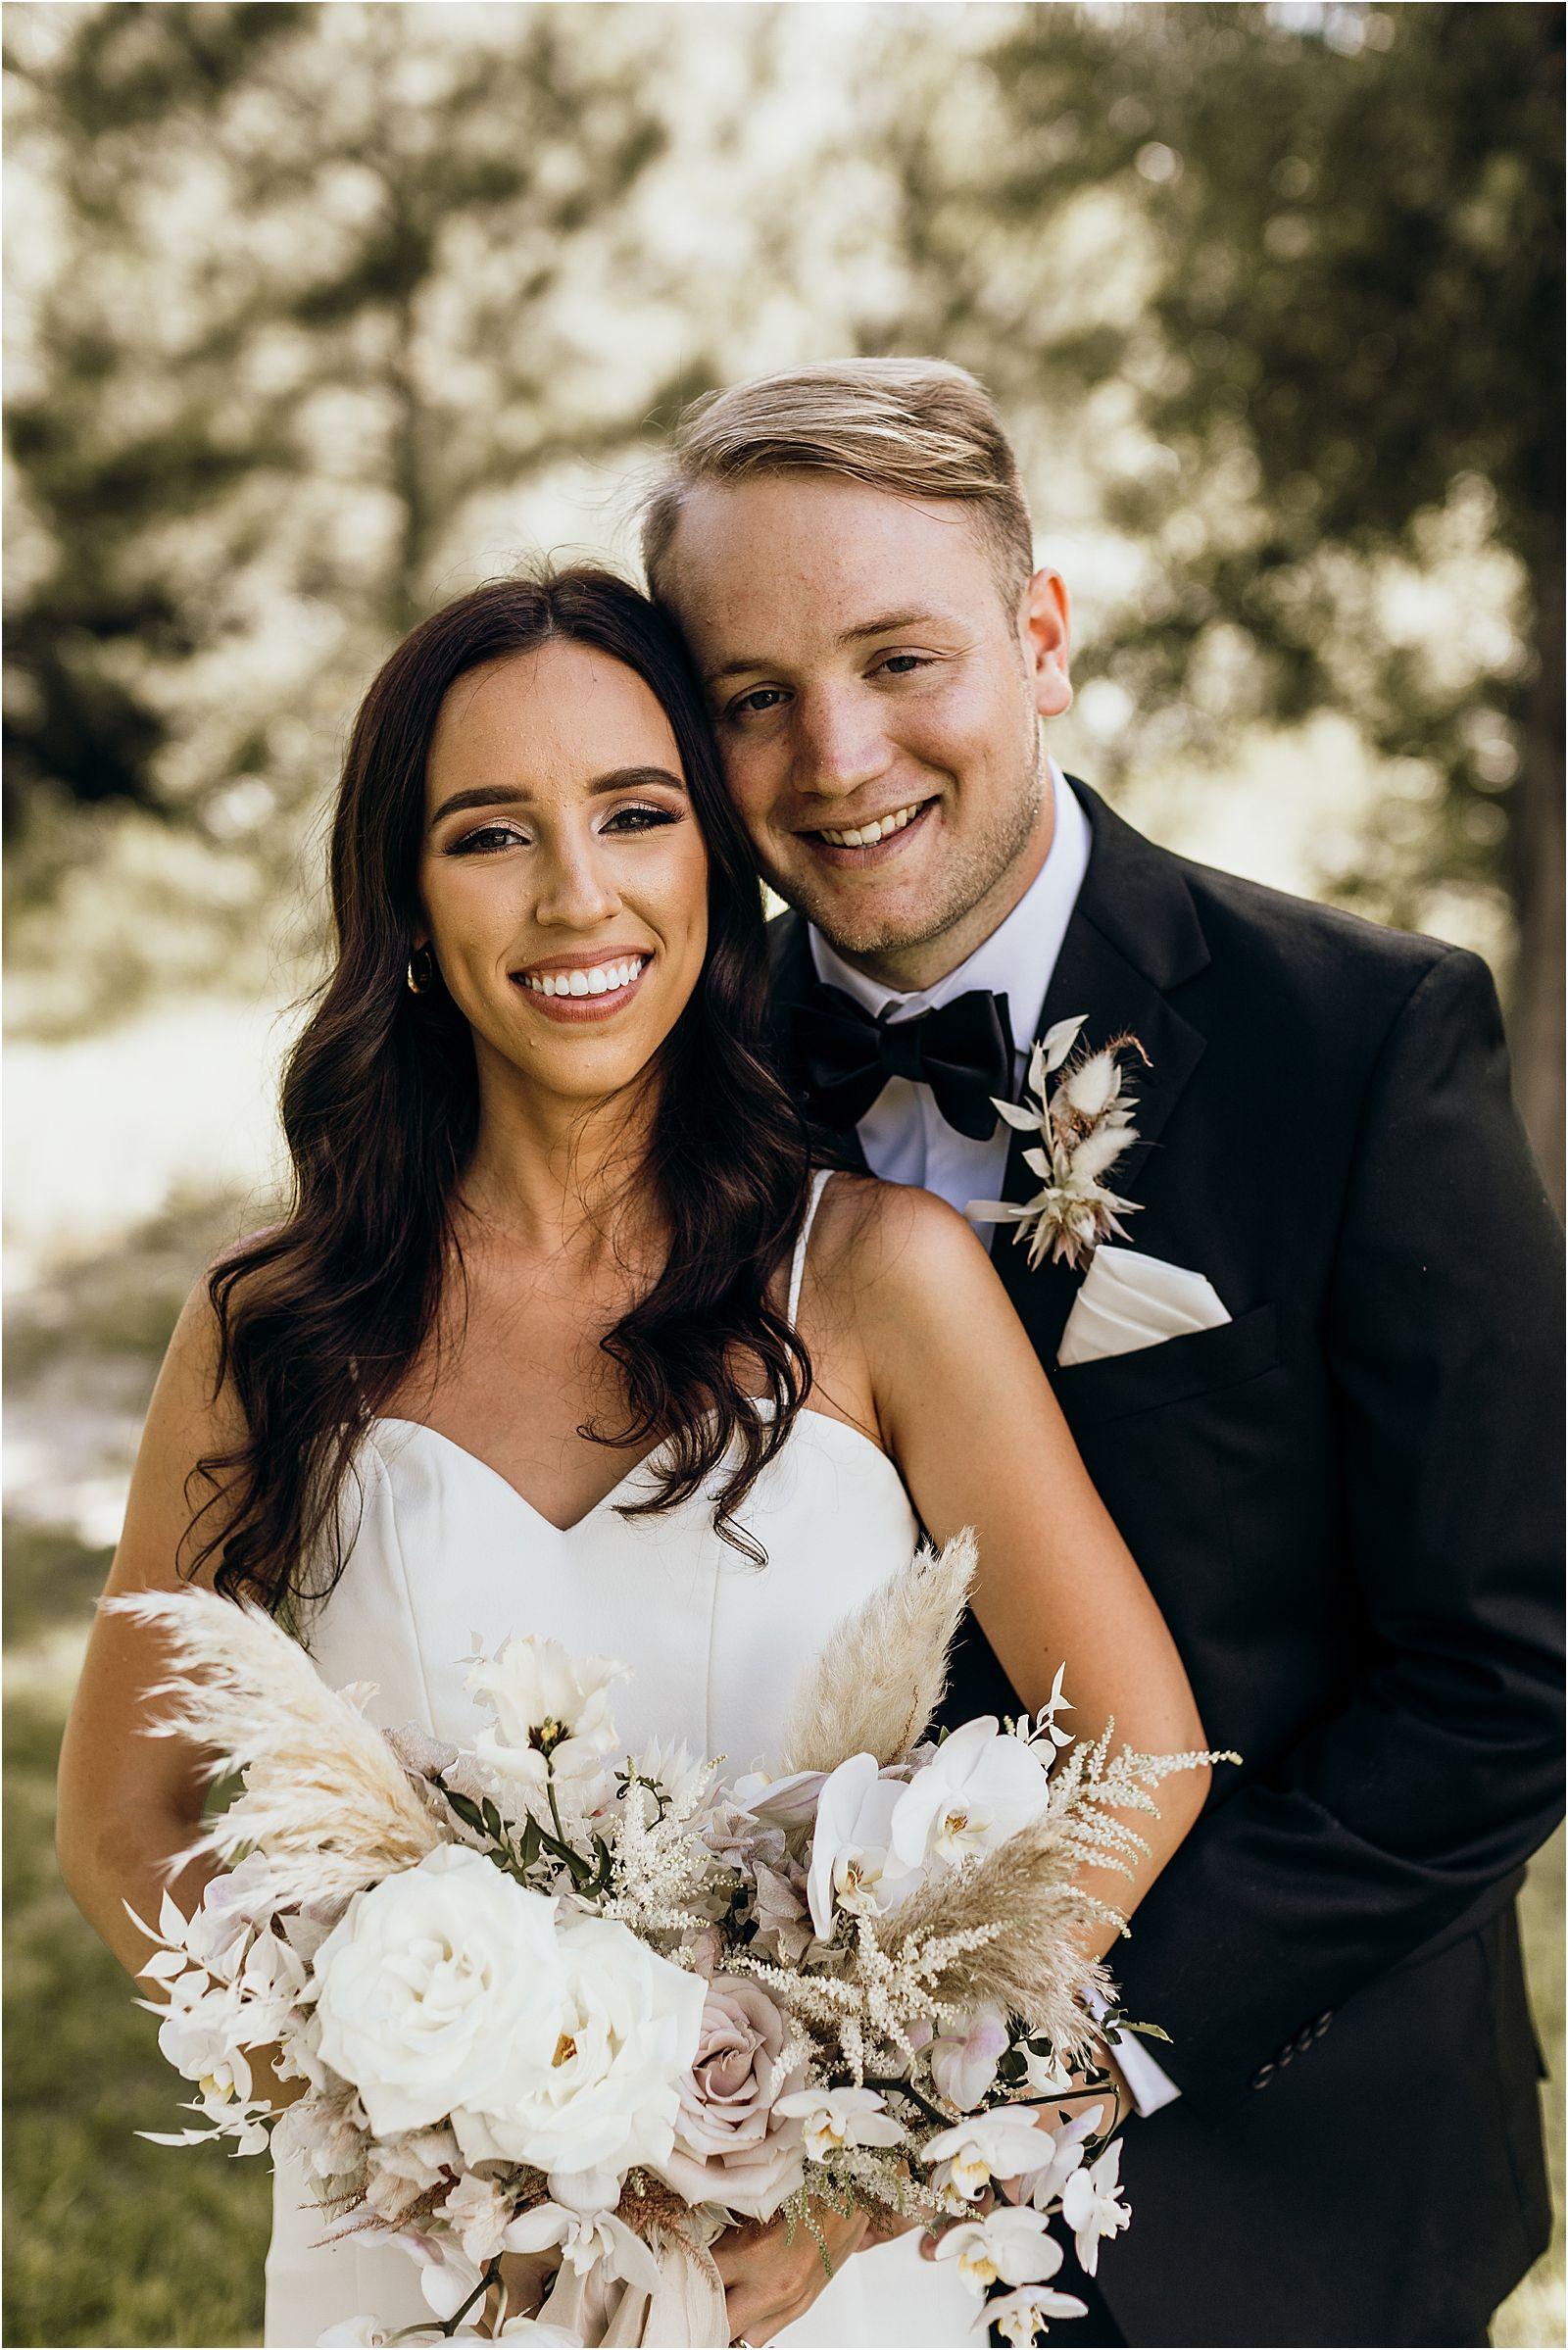 Casey + Josh   Pearl in the Wild Tallahassee Wedding   Love ...